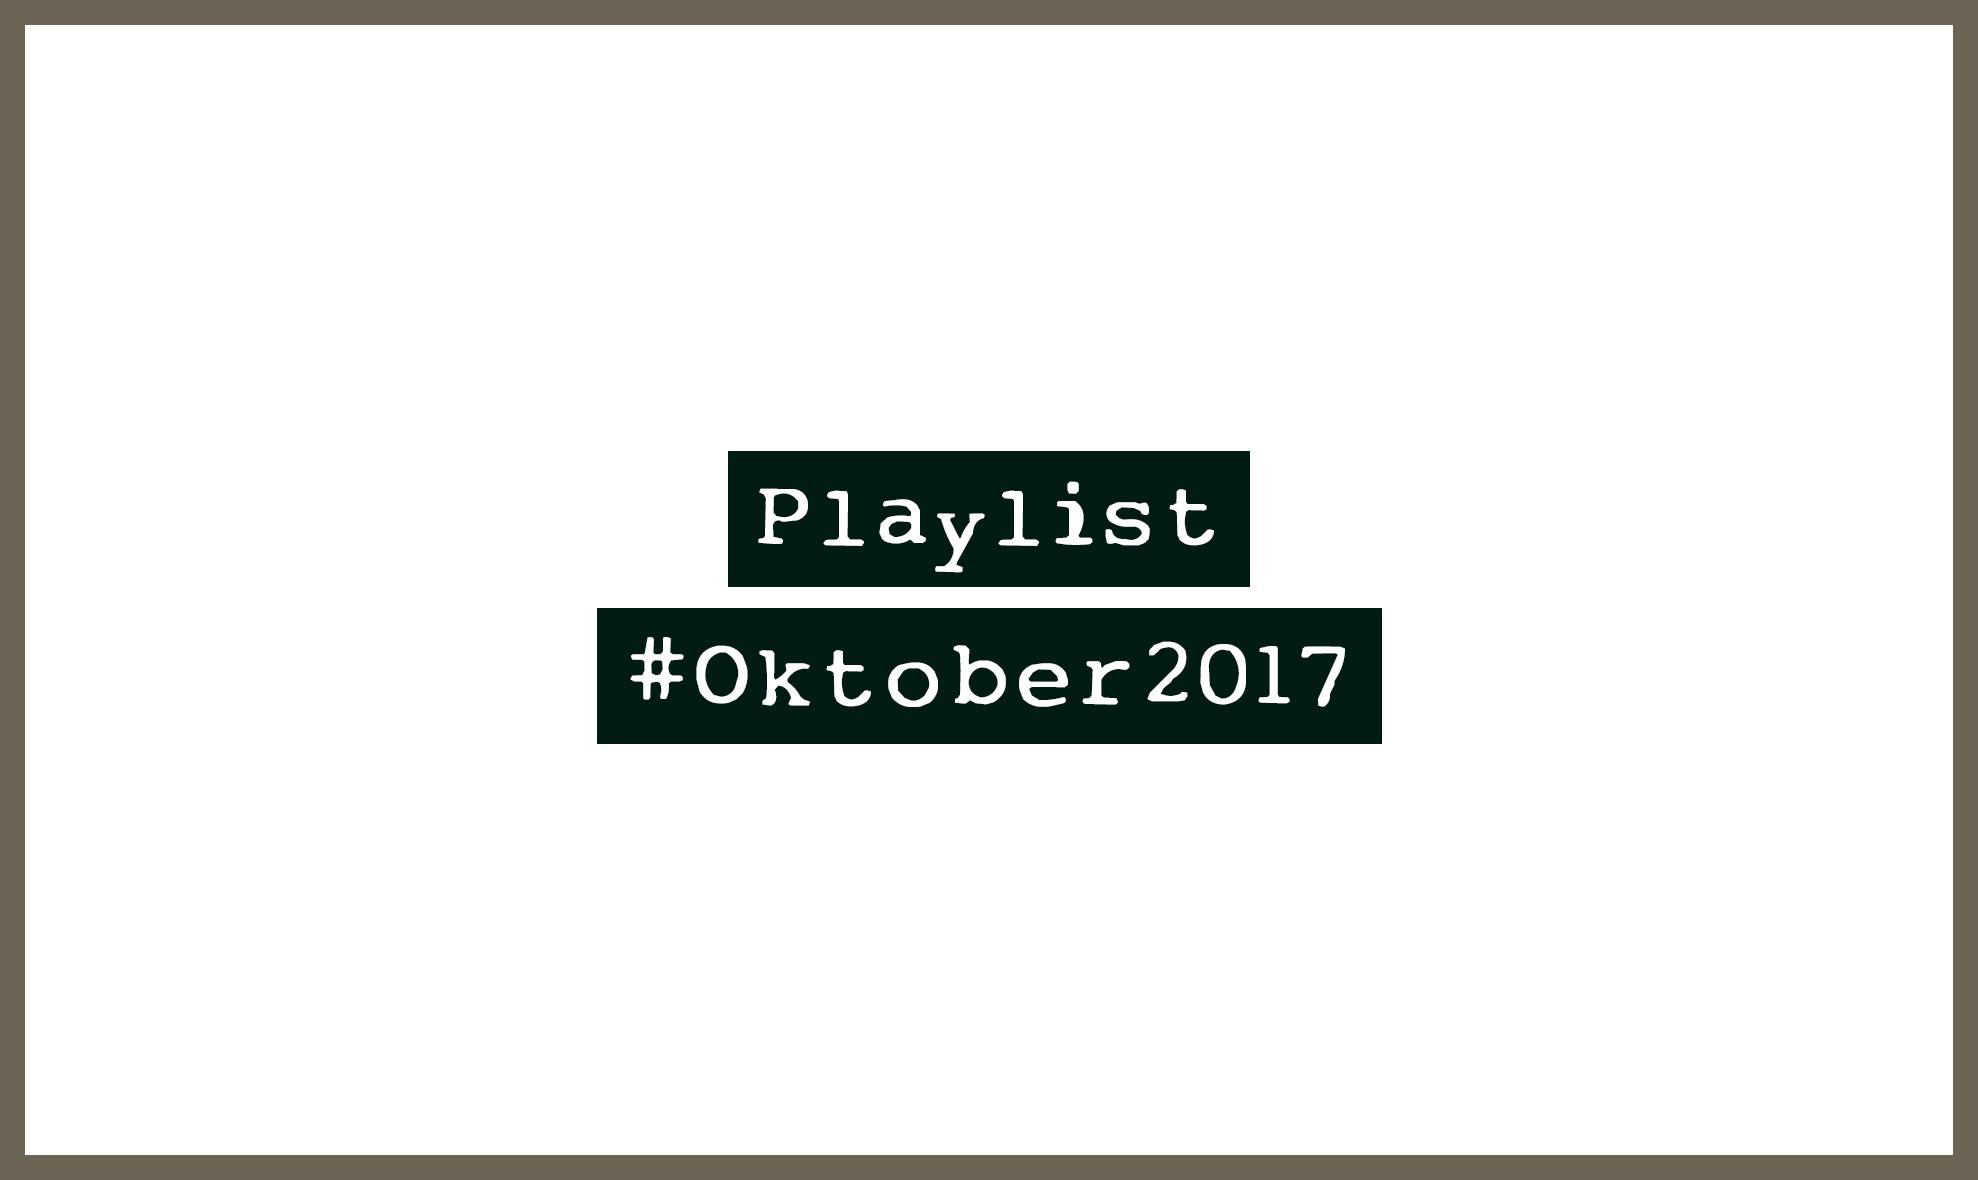 Playlist #Oktober2017